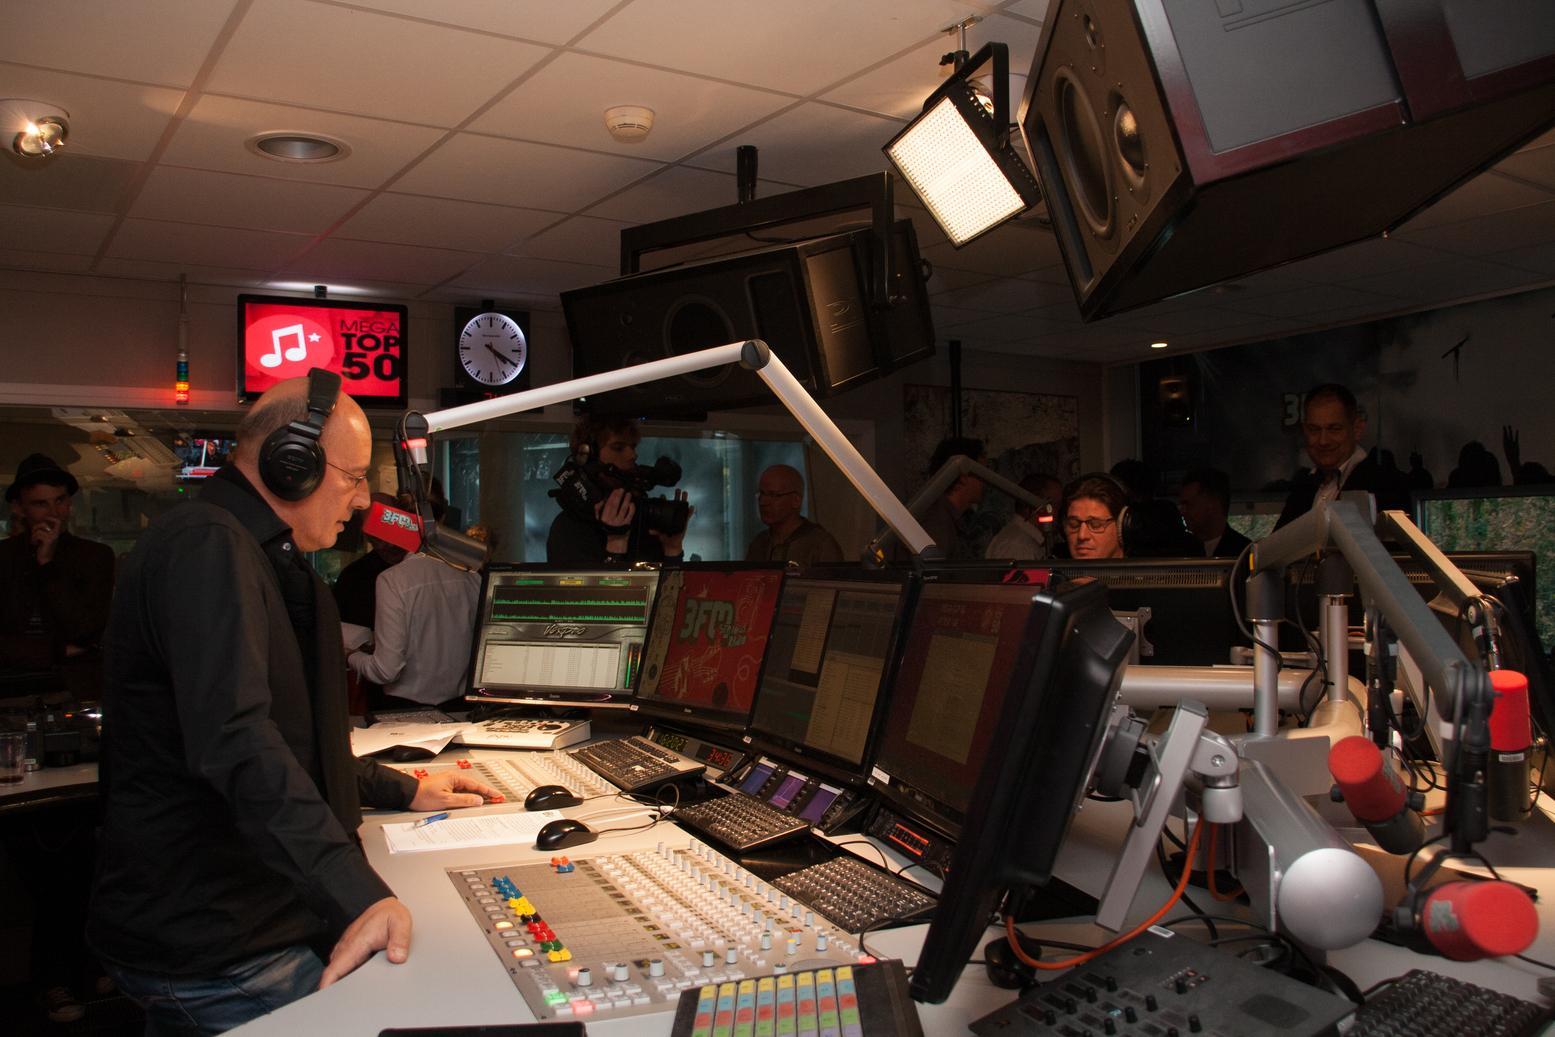 2013-11-30-3FM-MegaTop50-619.jpg